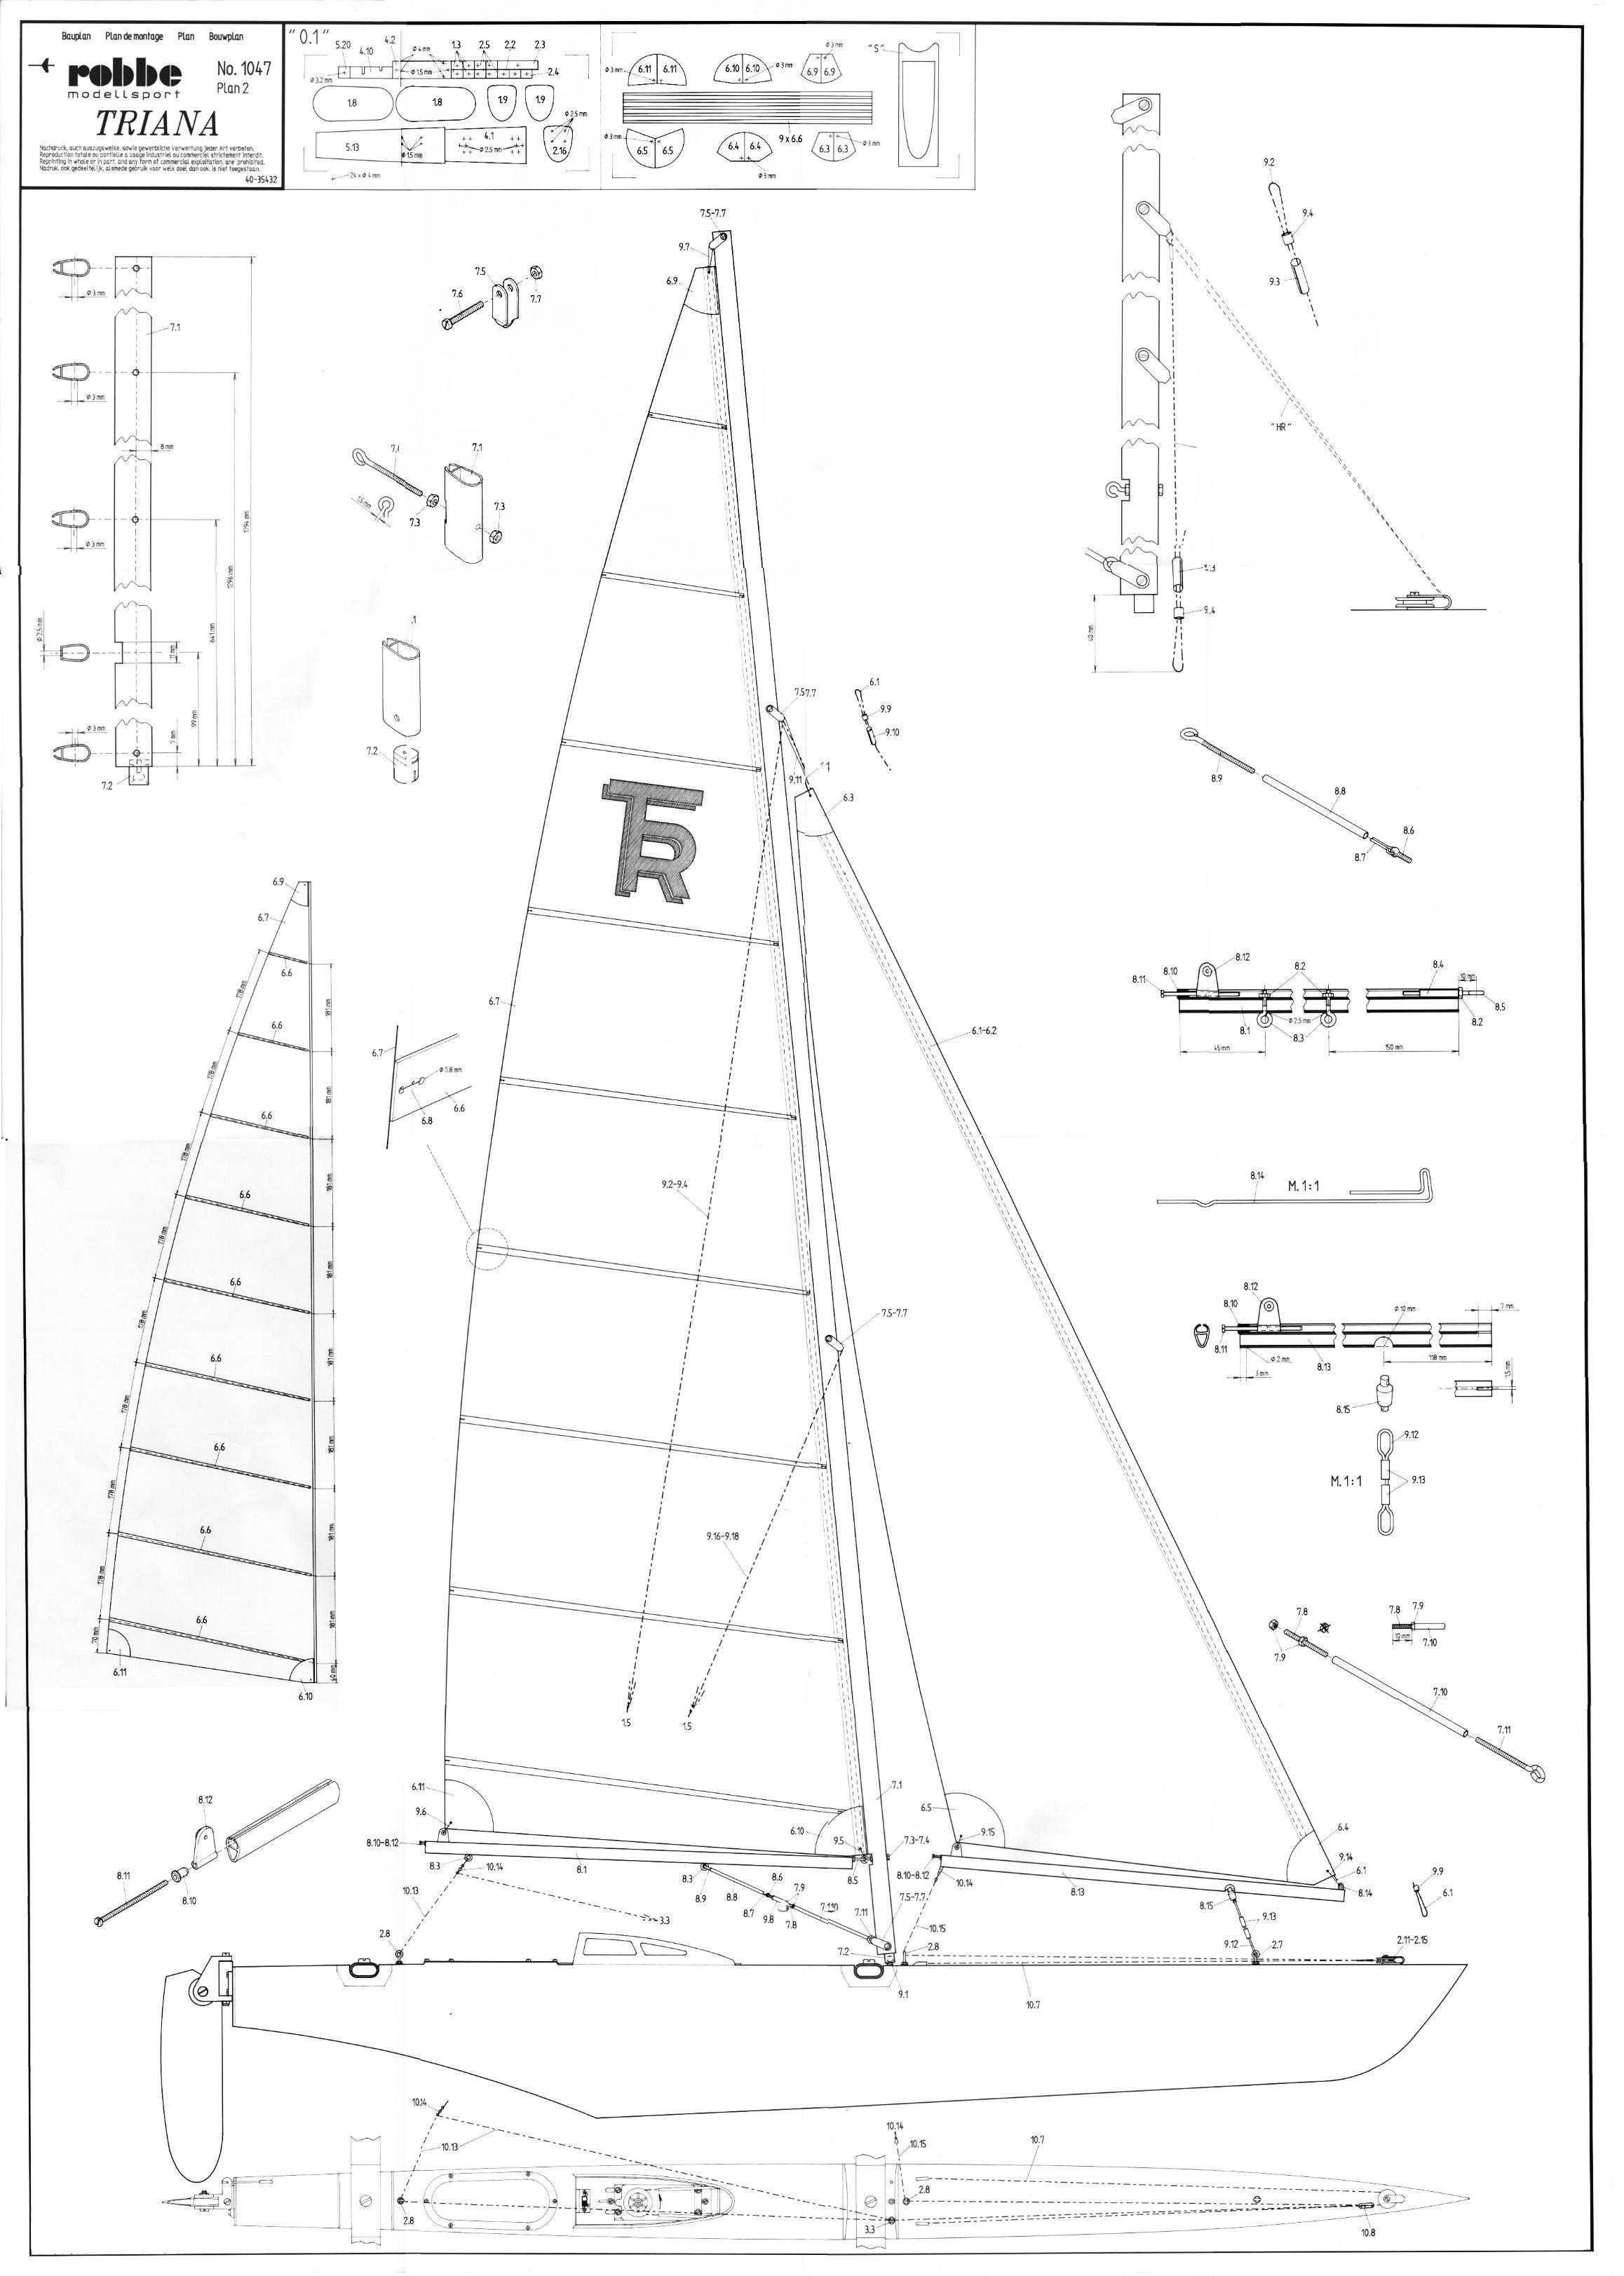 hight resolution of iwema enterprise the power of rc multi hull sailing plans triana hunter sailboat diagram power sailboat diagram